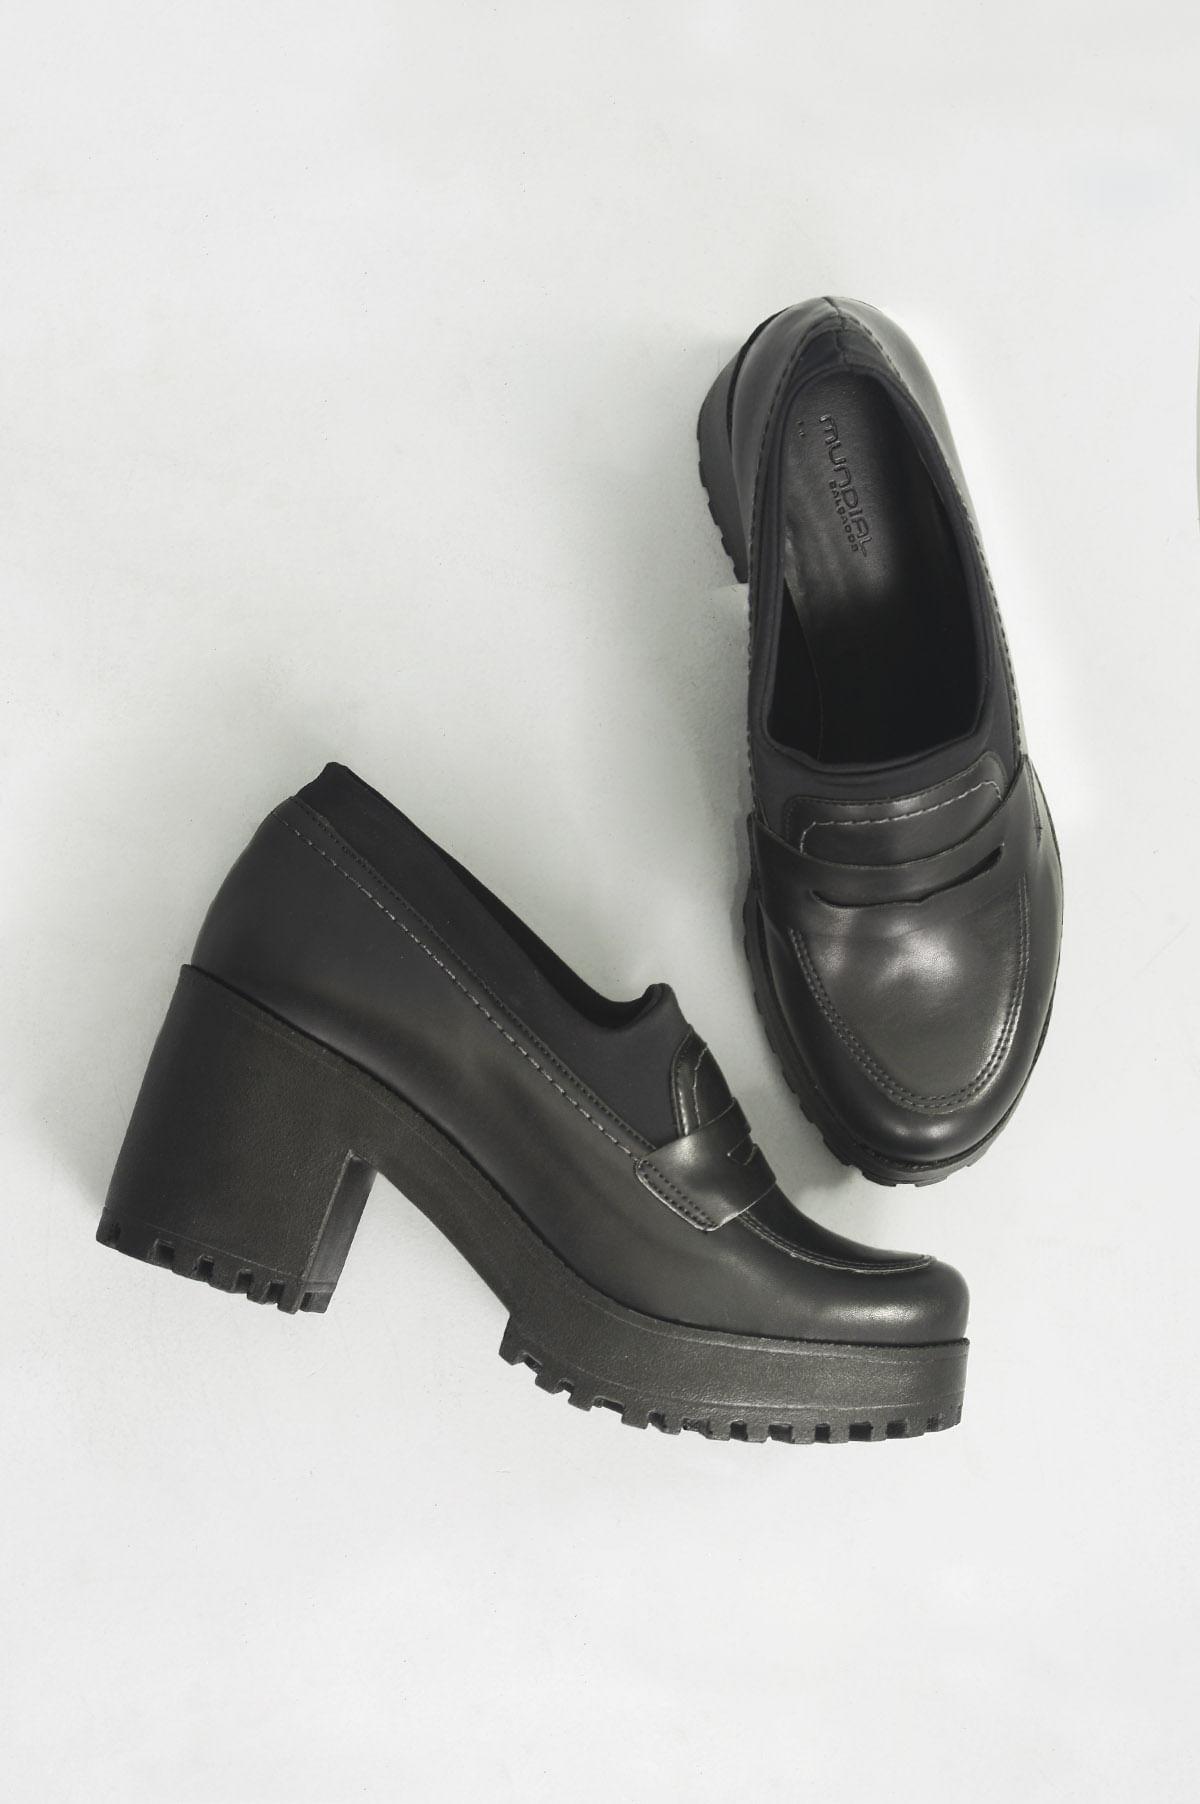 71c35a6d1a Sapato Salto Alto Loren Mundial SINT - PRETO - Mundial Calçados